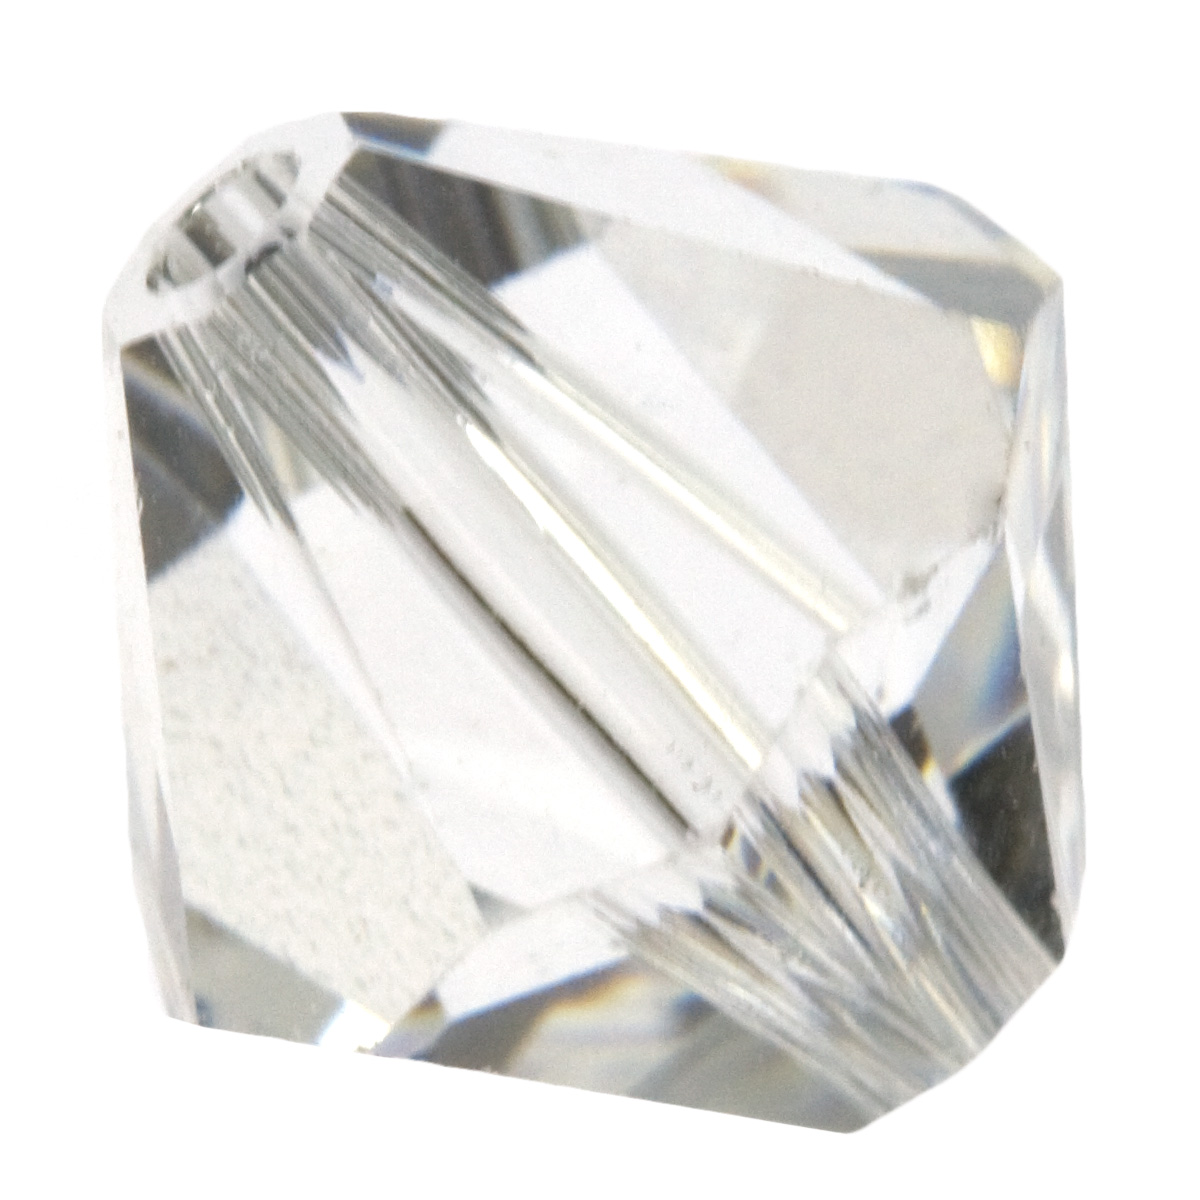 8mm Crystal 5328 Bi-Cone Swarovski Crystal Beads - Pack of 6: Wire